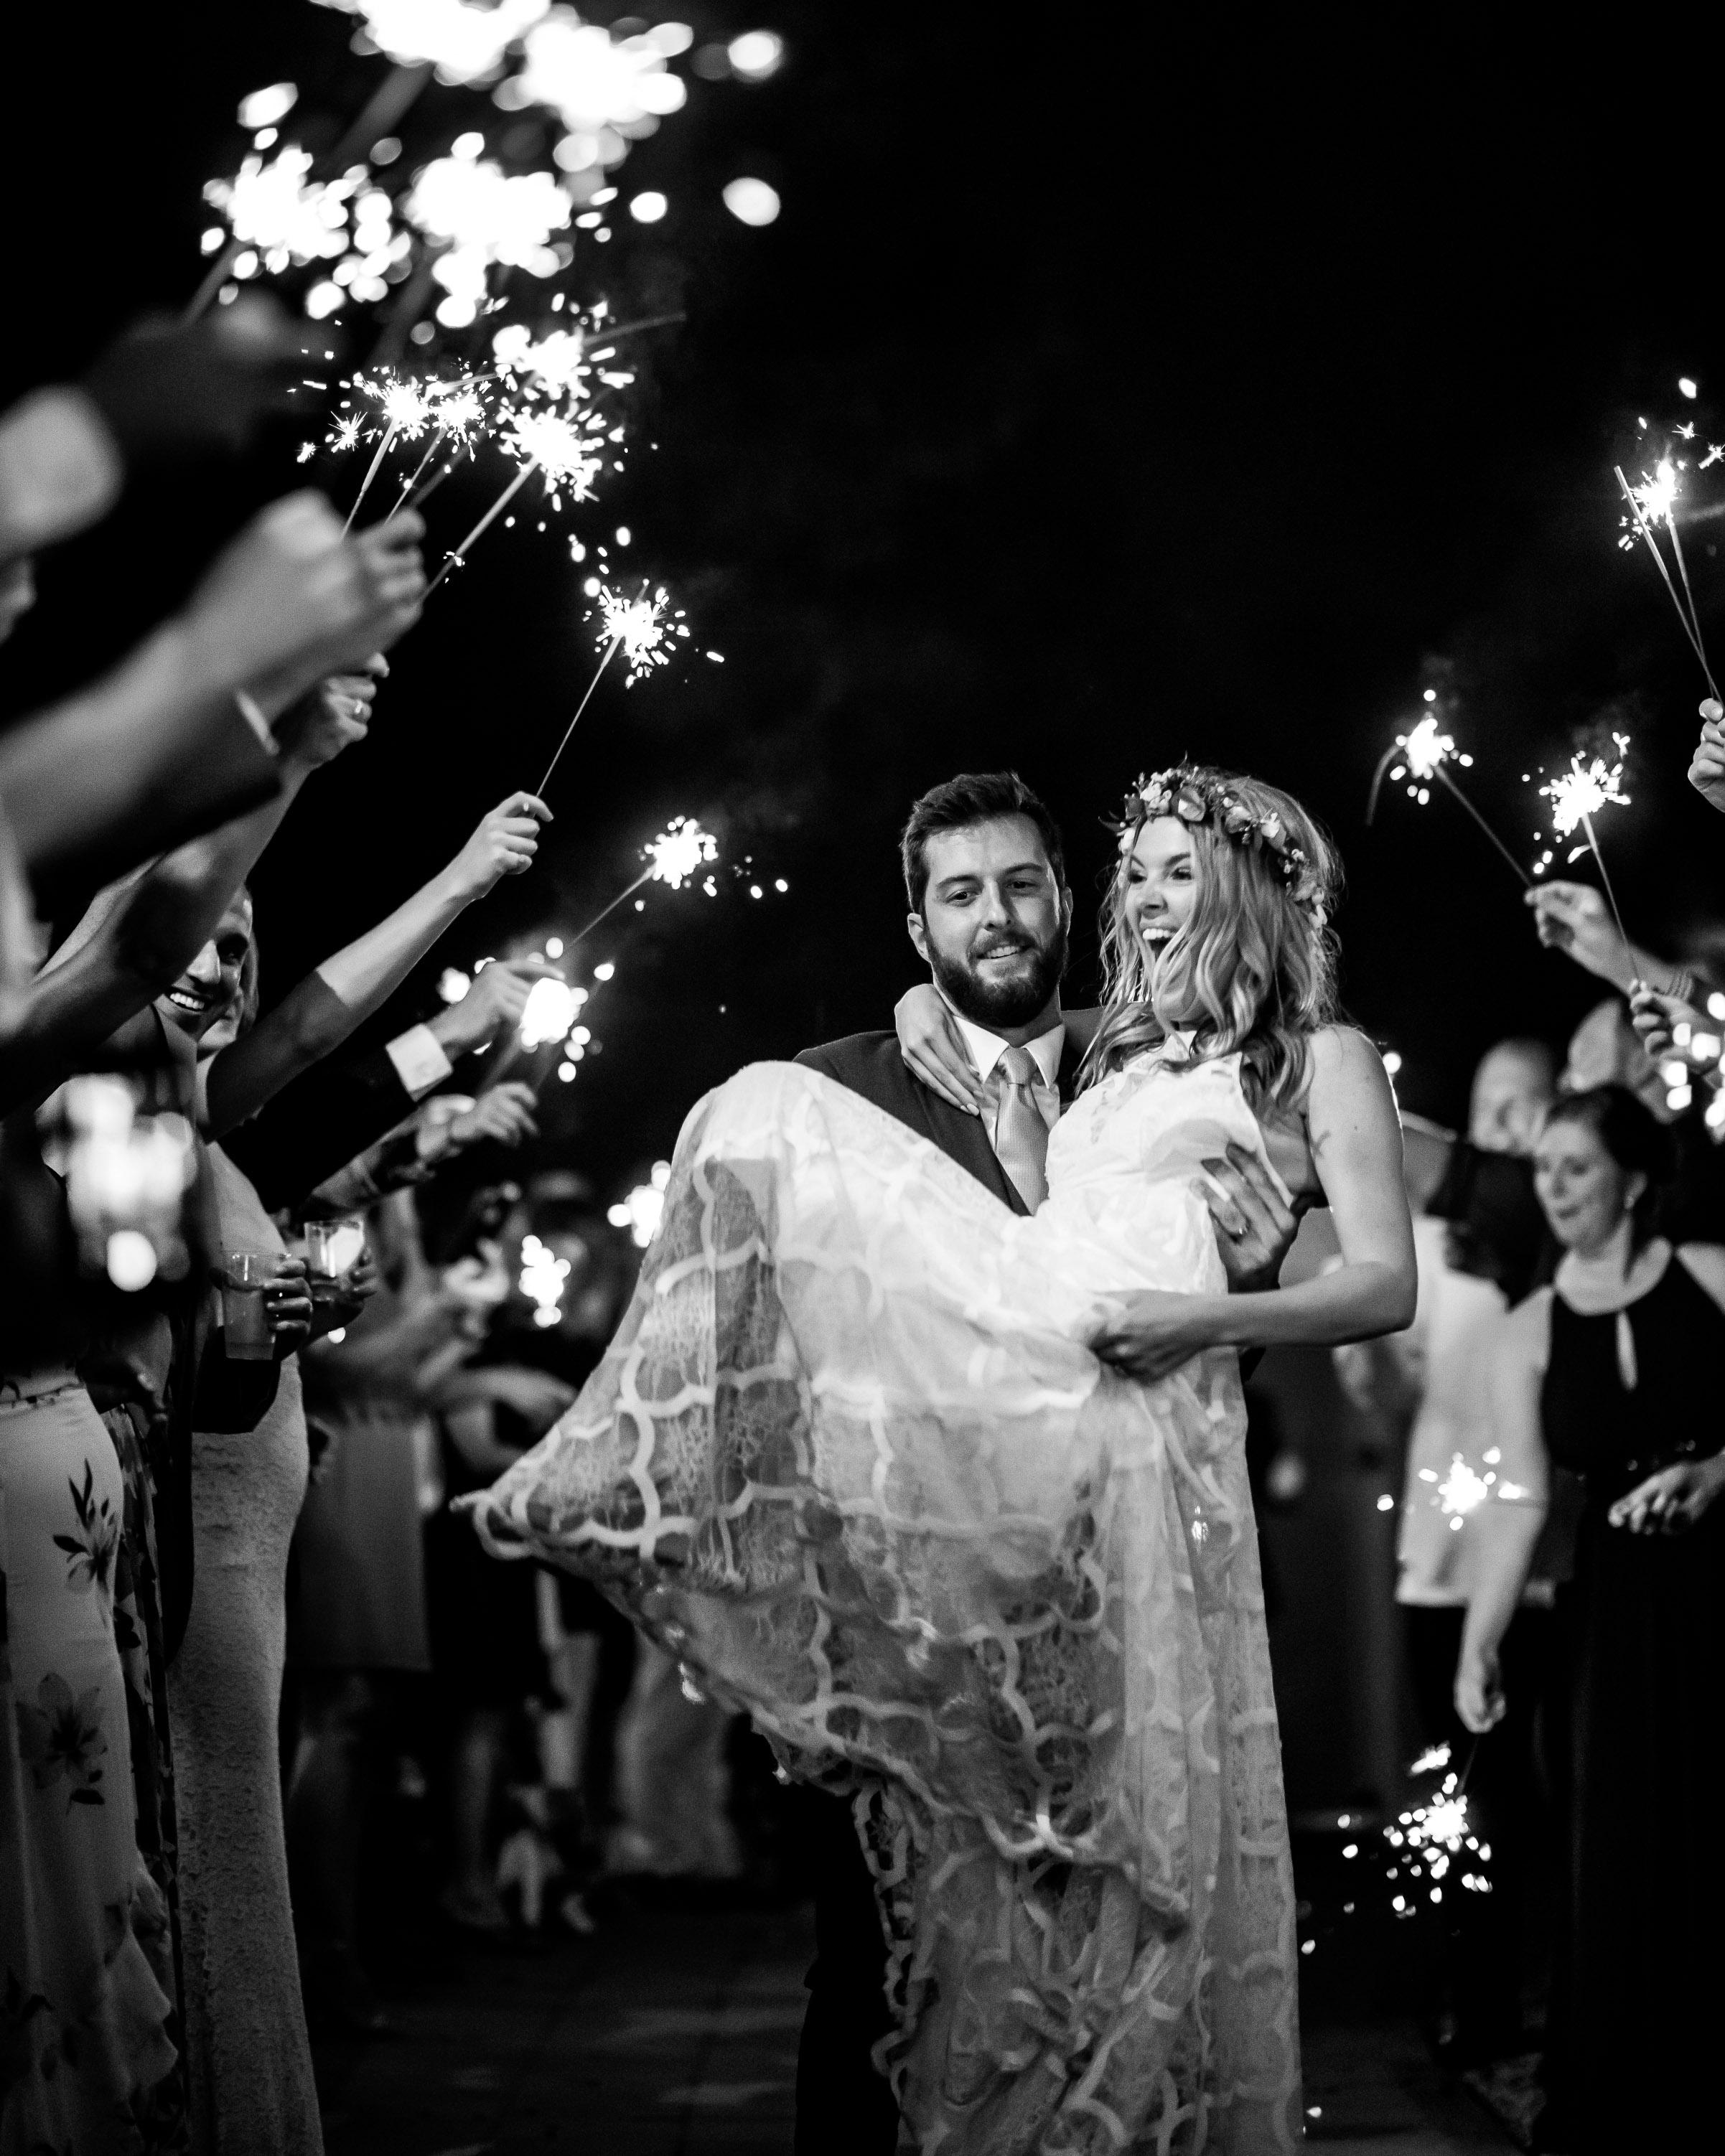 wedding exits sparklers